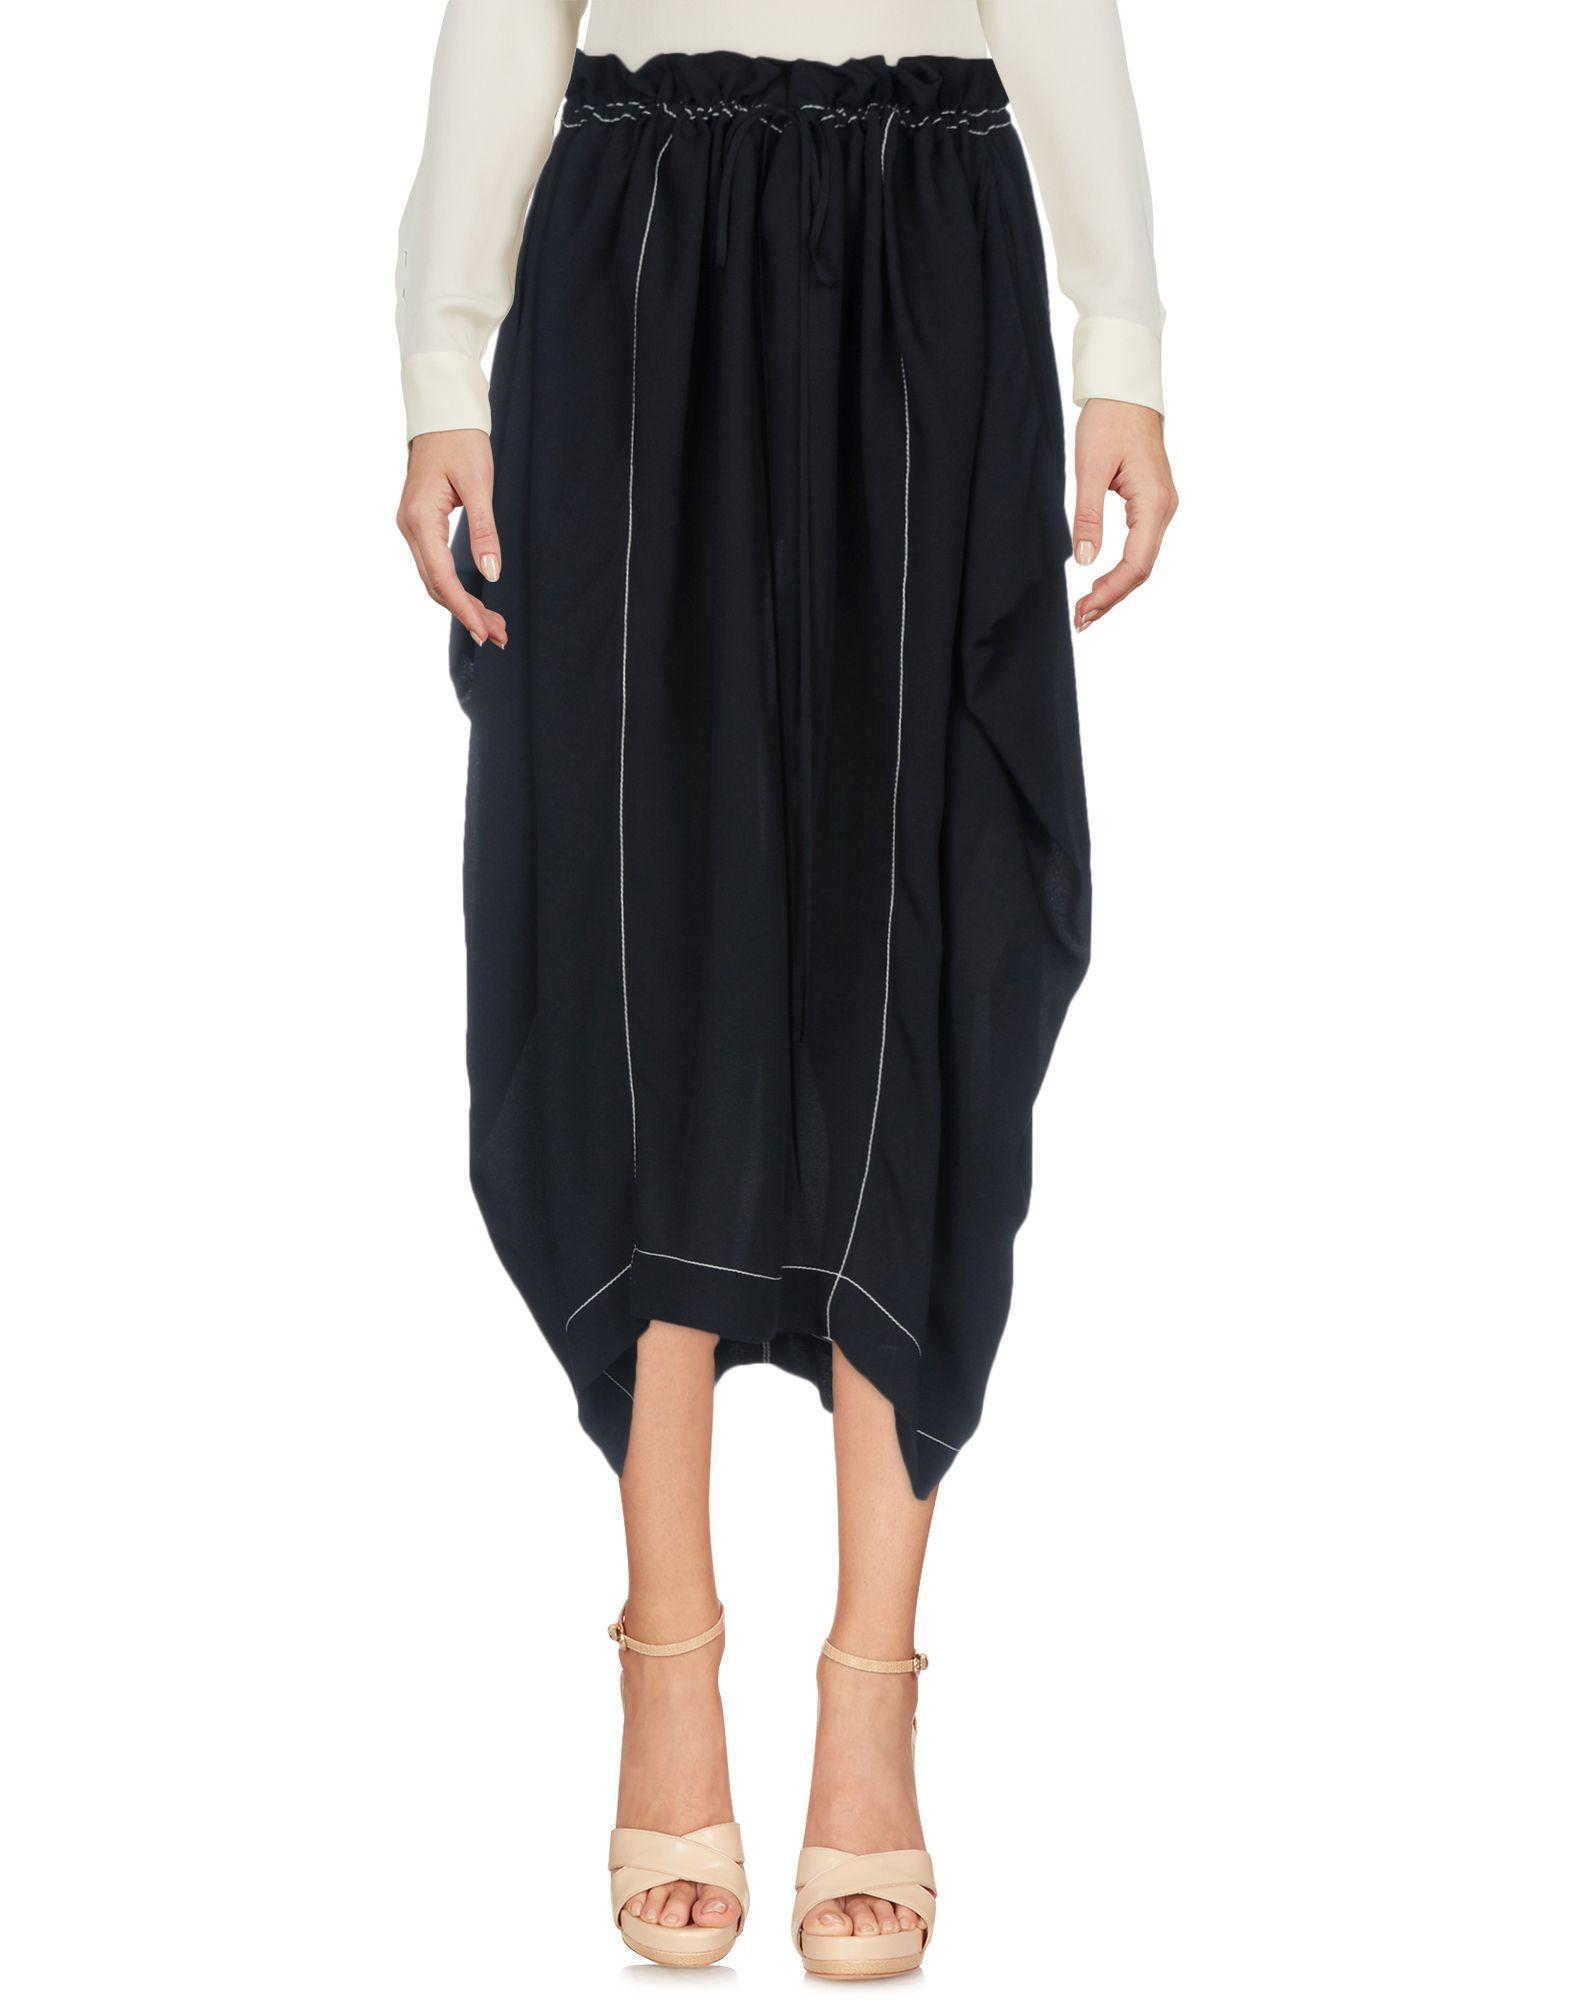 Stella Mccartney Midi Skirts In Dark Blue